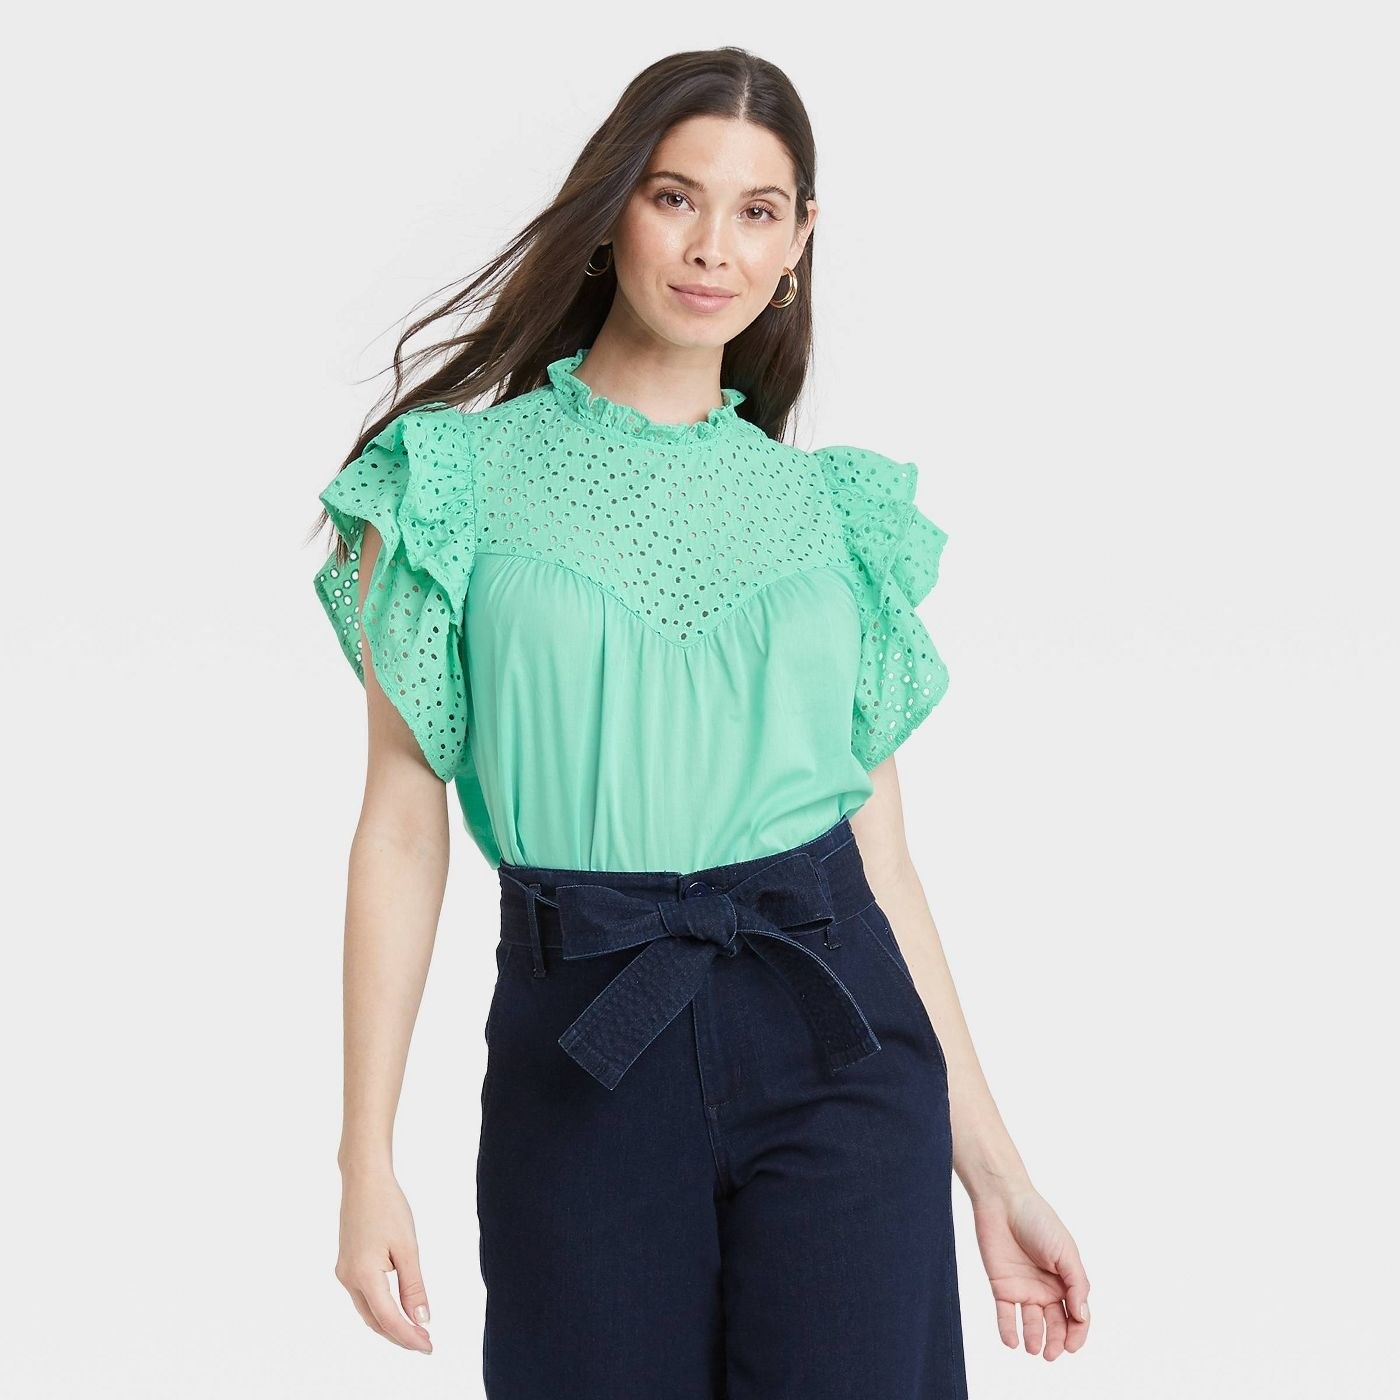 Model wearing sea green top